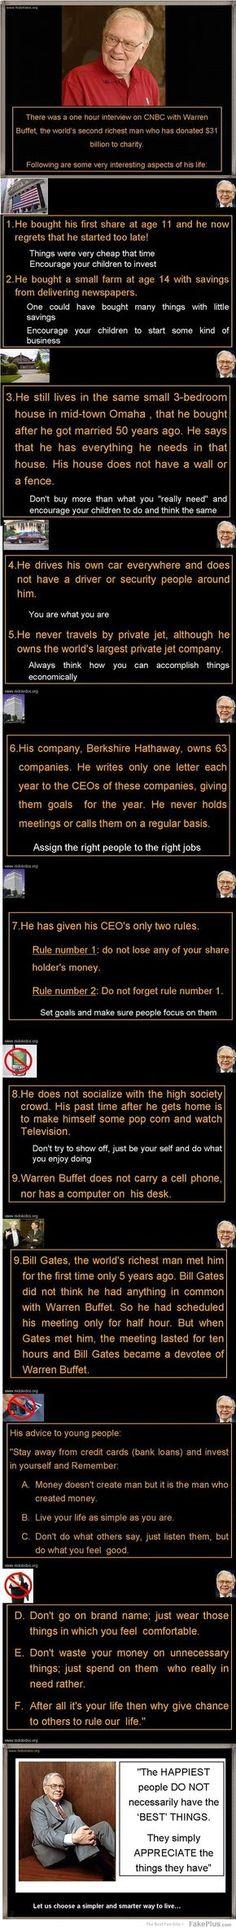 Simple, yet smart financial tips from Warren Buffett, the second richest man in . Warren Buffett, Move On, Warren Buffet Quotes, Rich Kids, Rich Man, Financial Tips, Way Of Life, Good Advice, Marketing